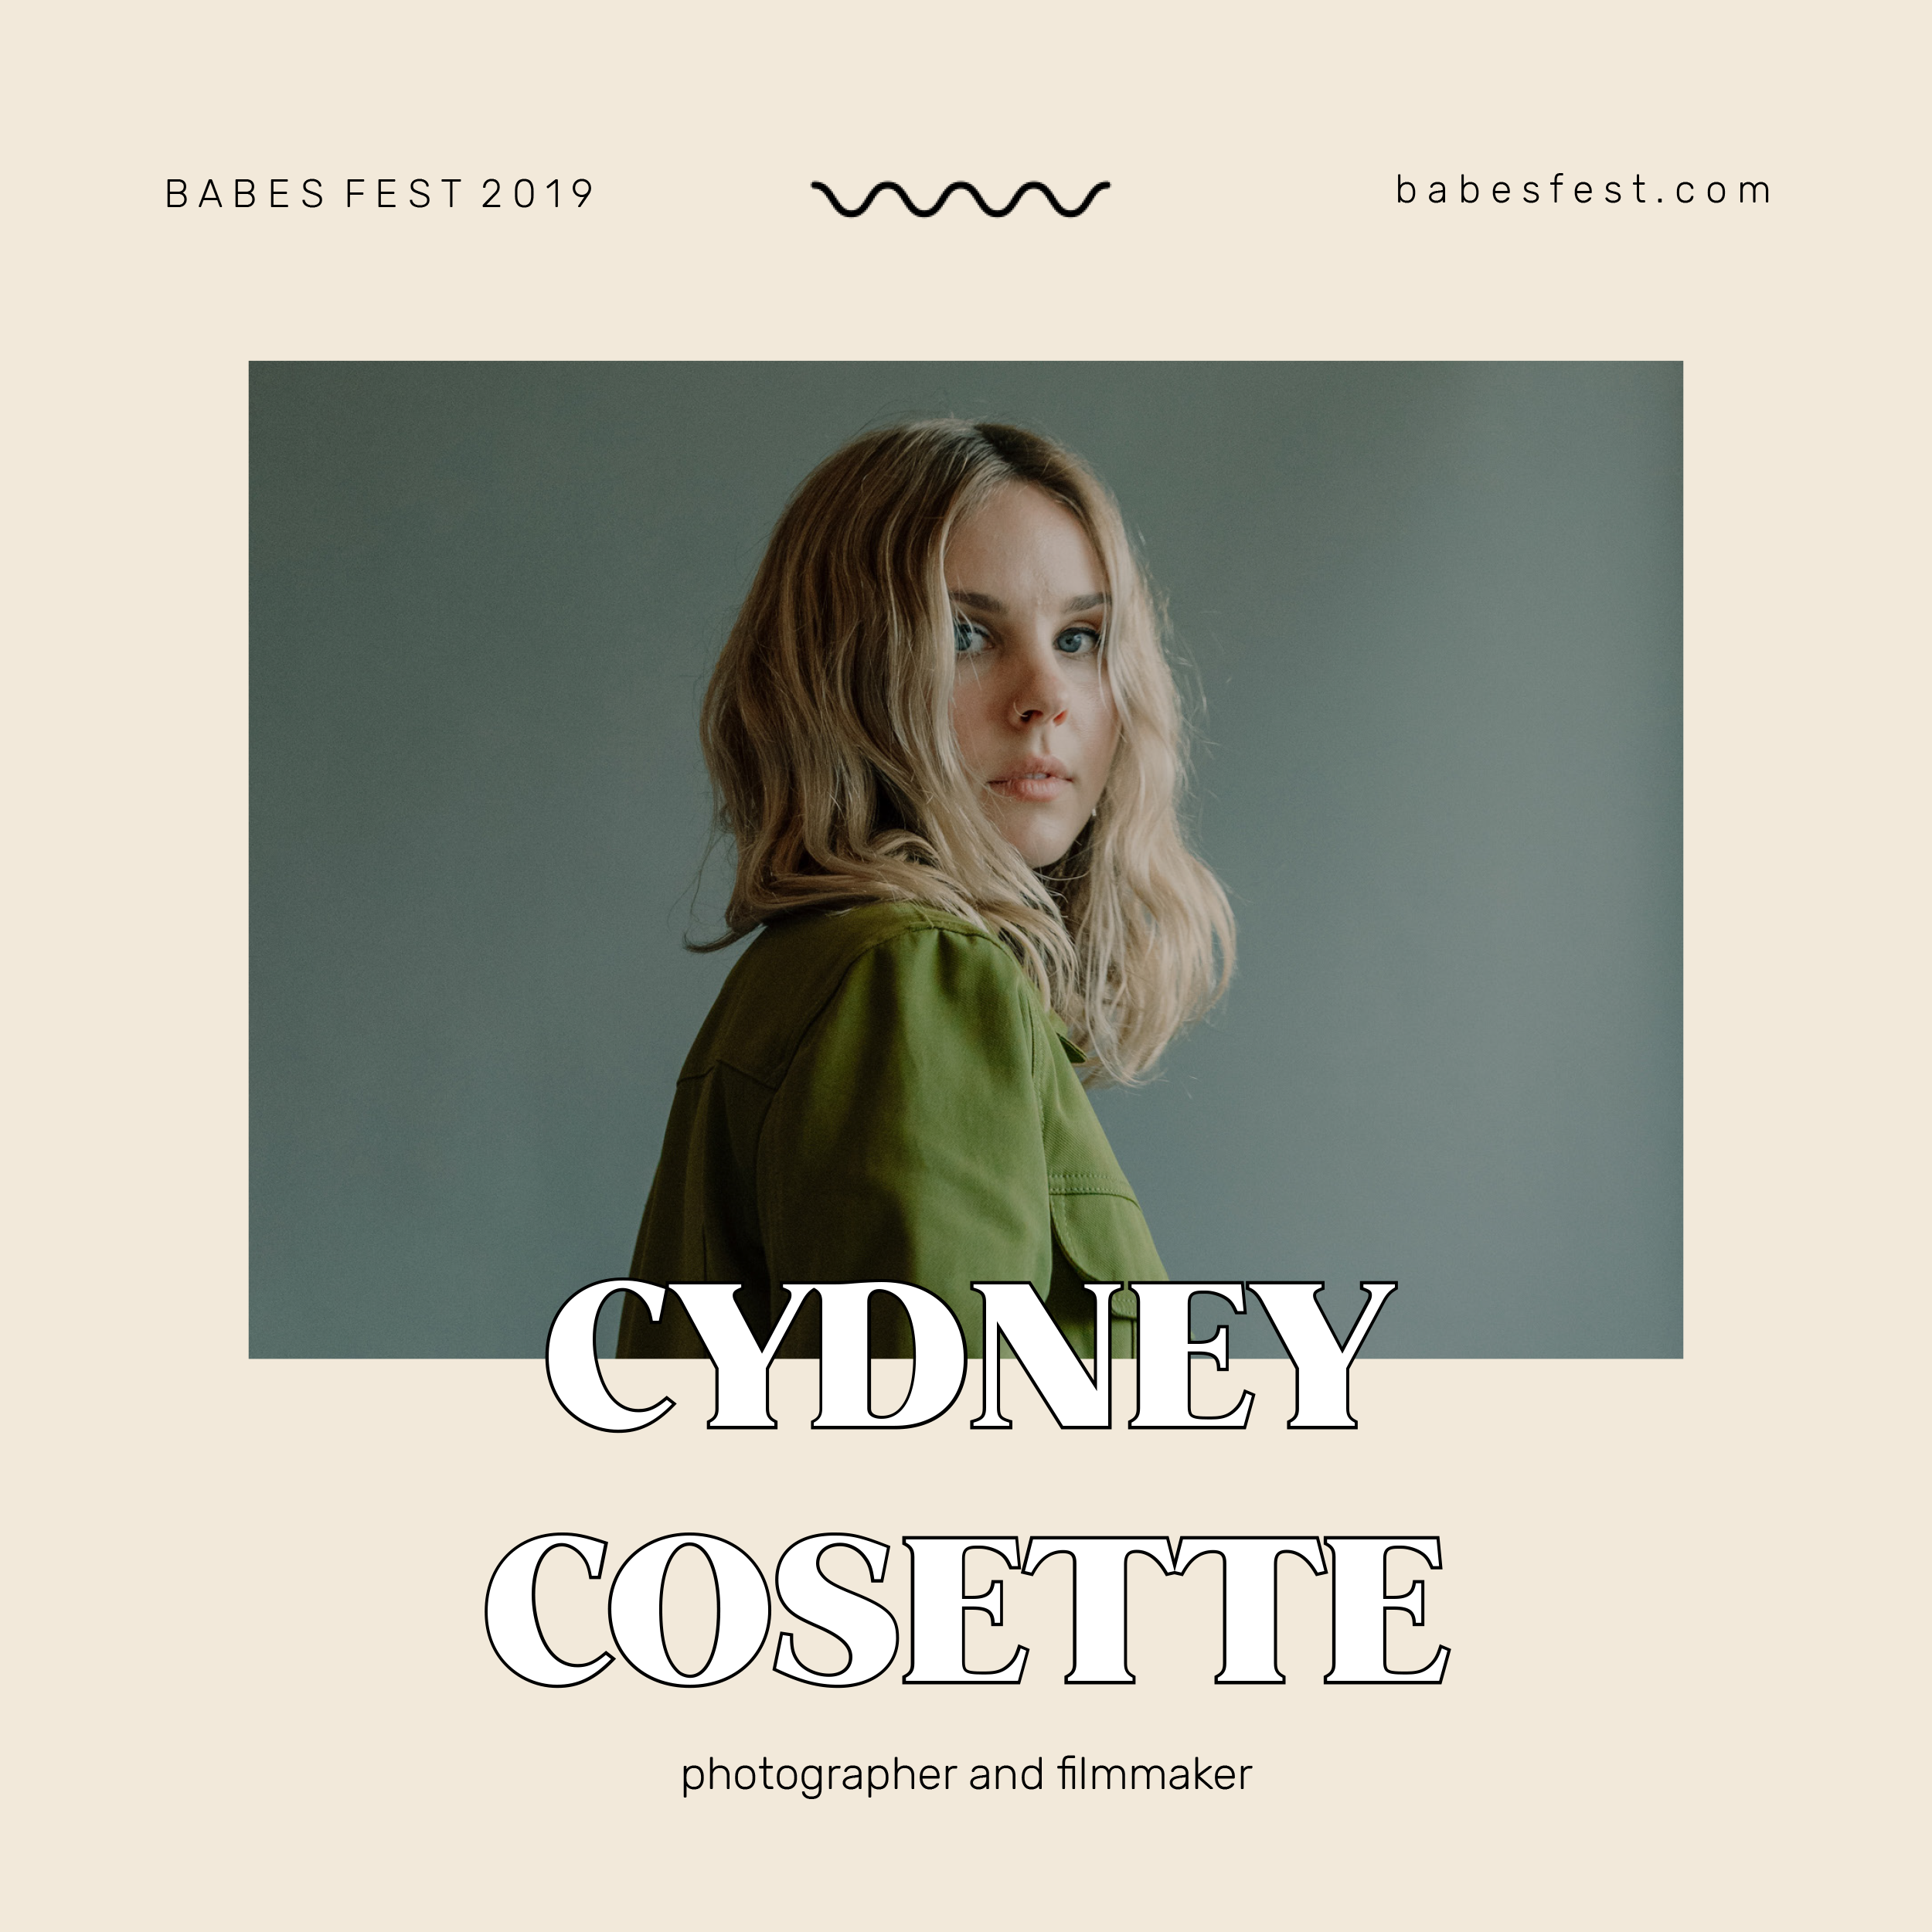 Cydney Cosette